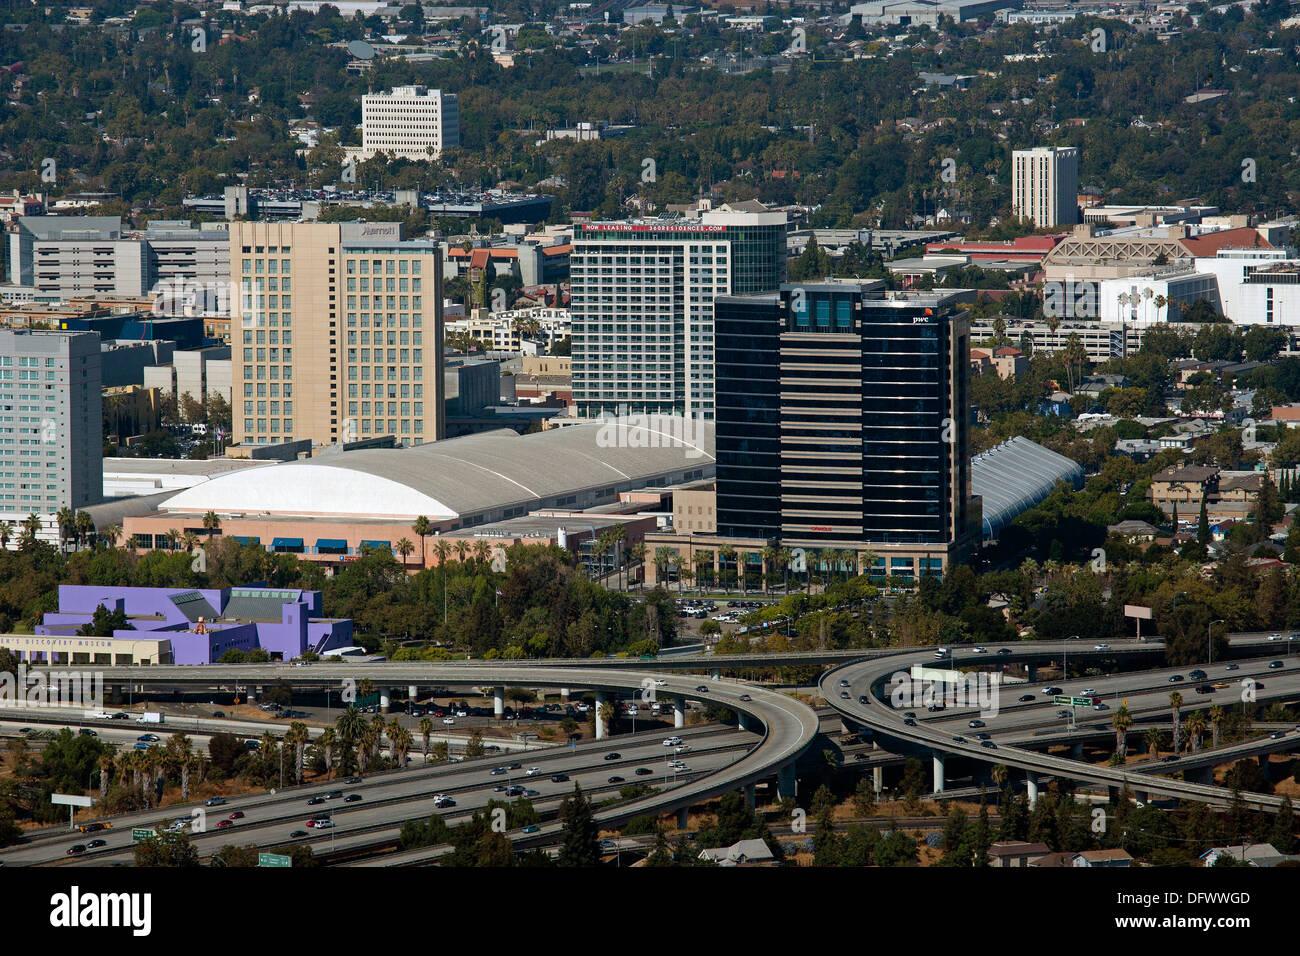 Fotografia aerea centro San Jose, Santa Clara, California Immagini Stock